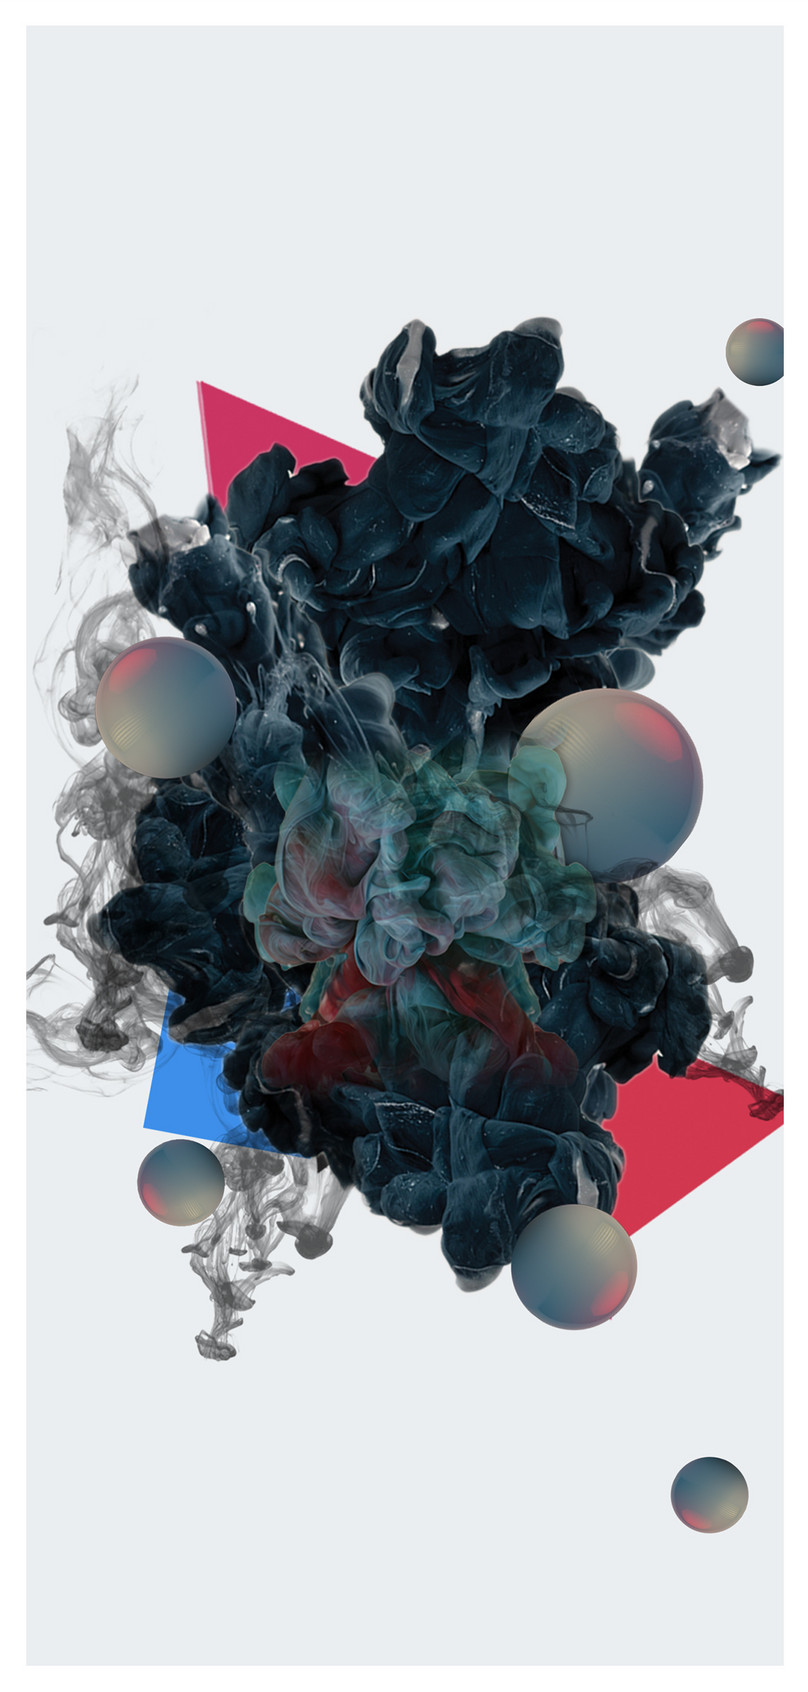 Abstract Black Smoke Mobile Wallpaper Abstract Black